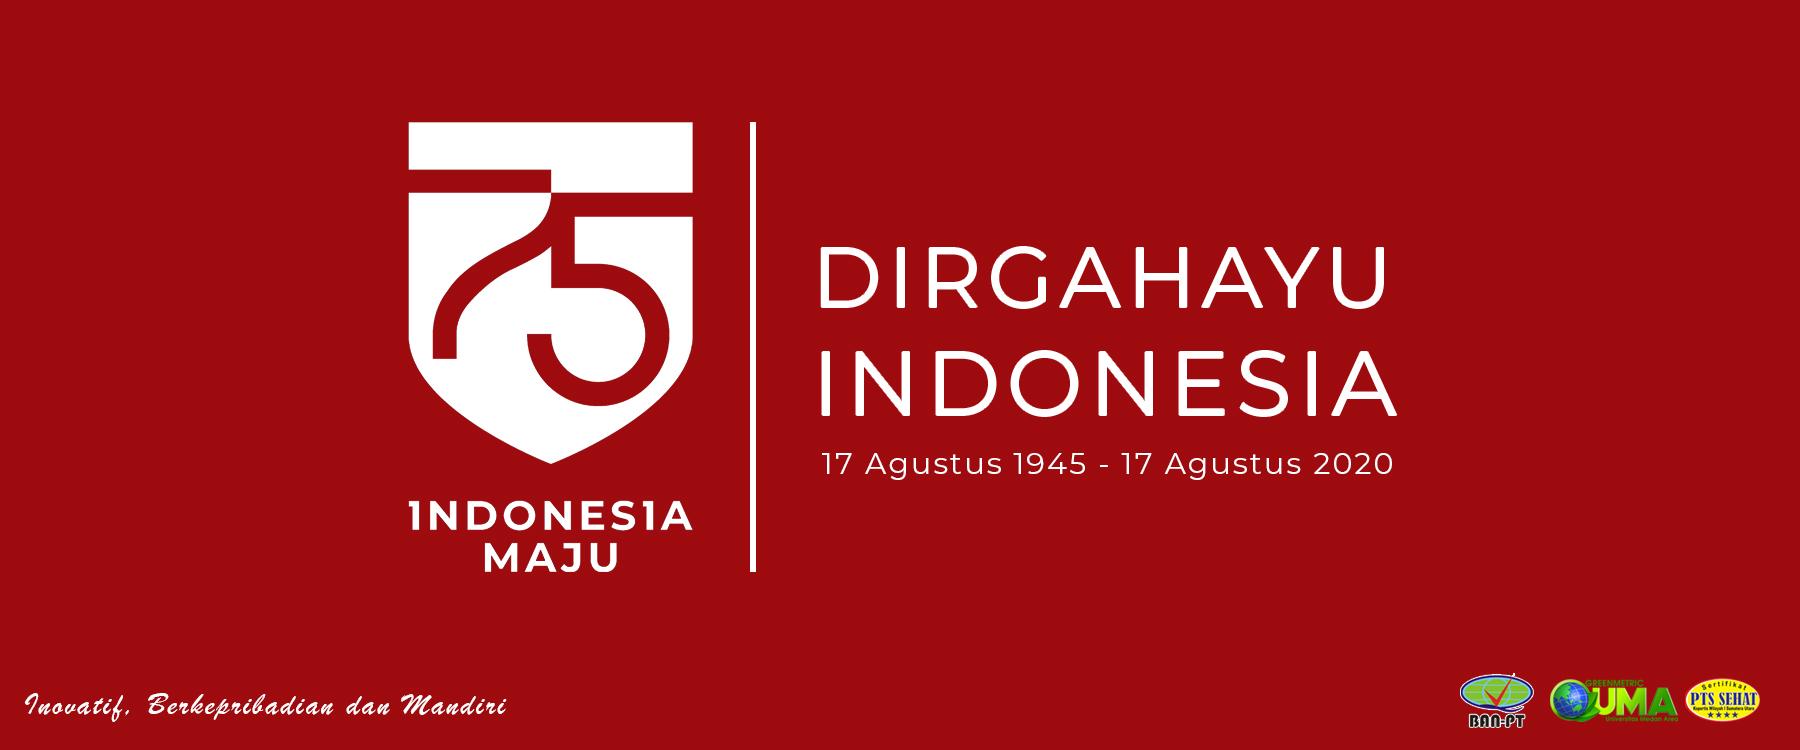 Slider Dirgahayu Indonesia 75th